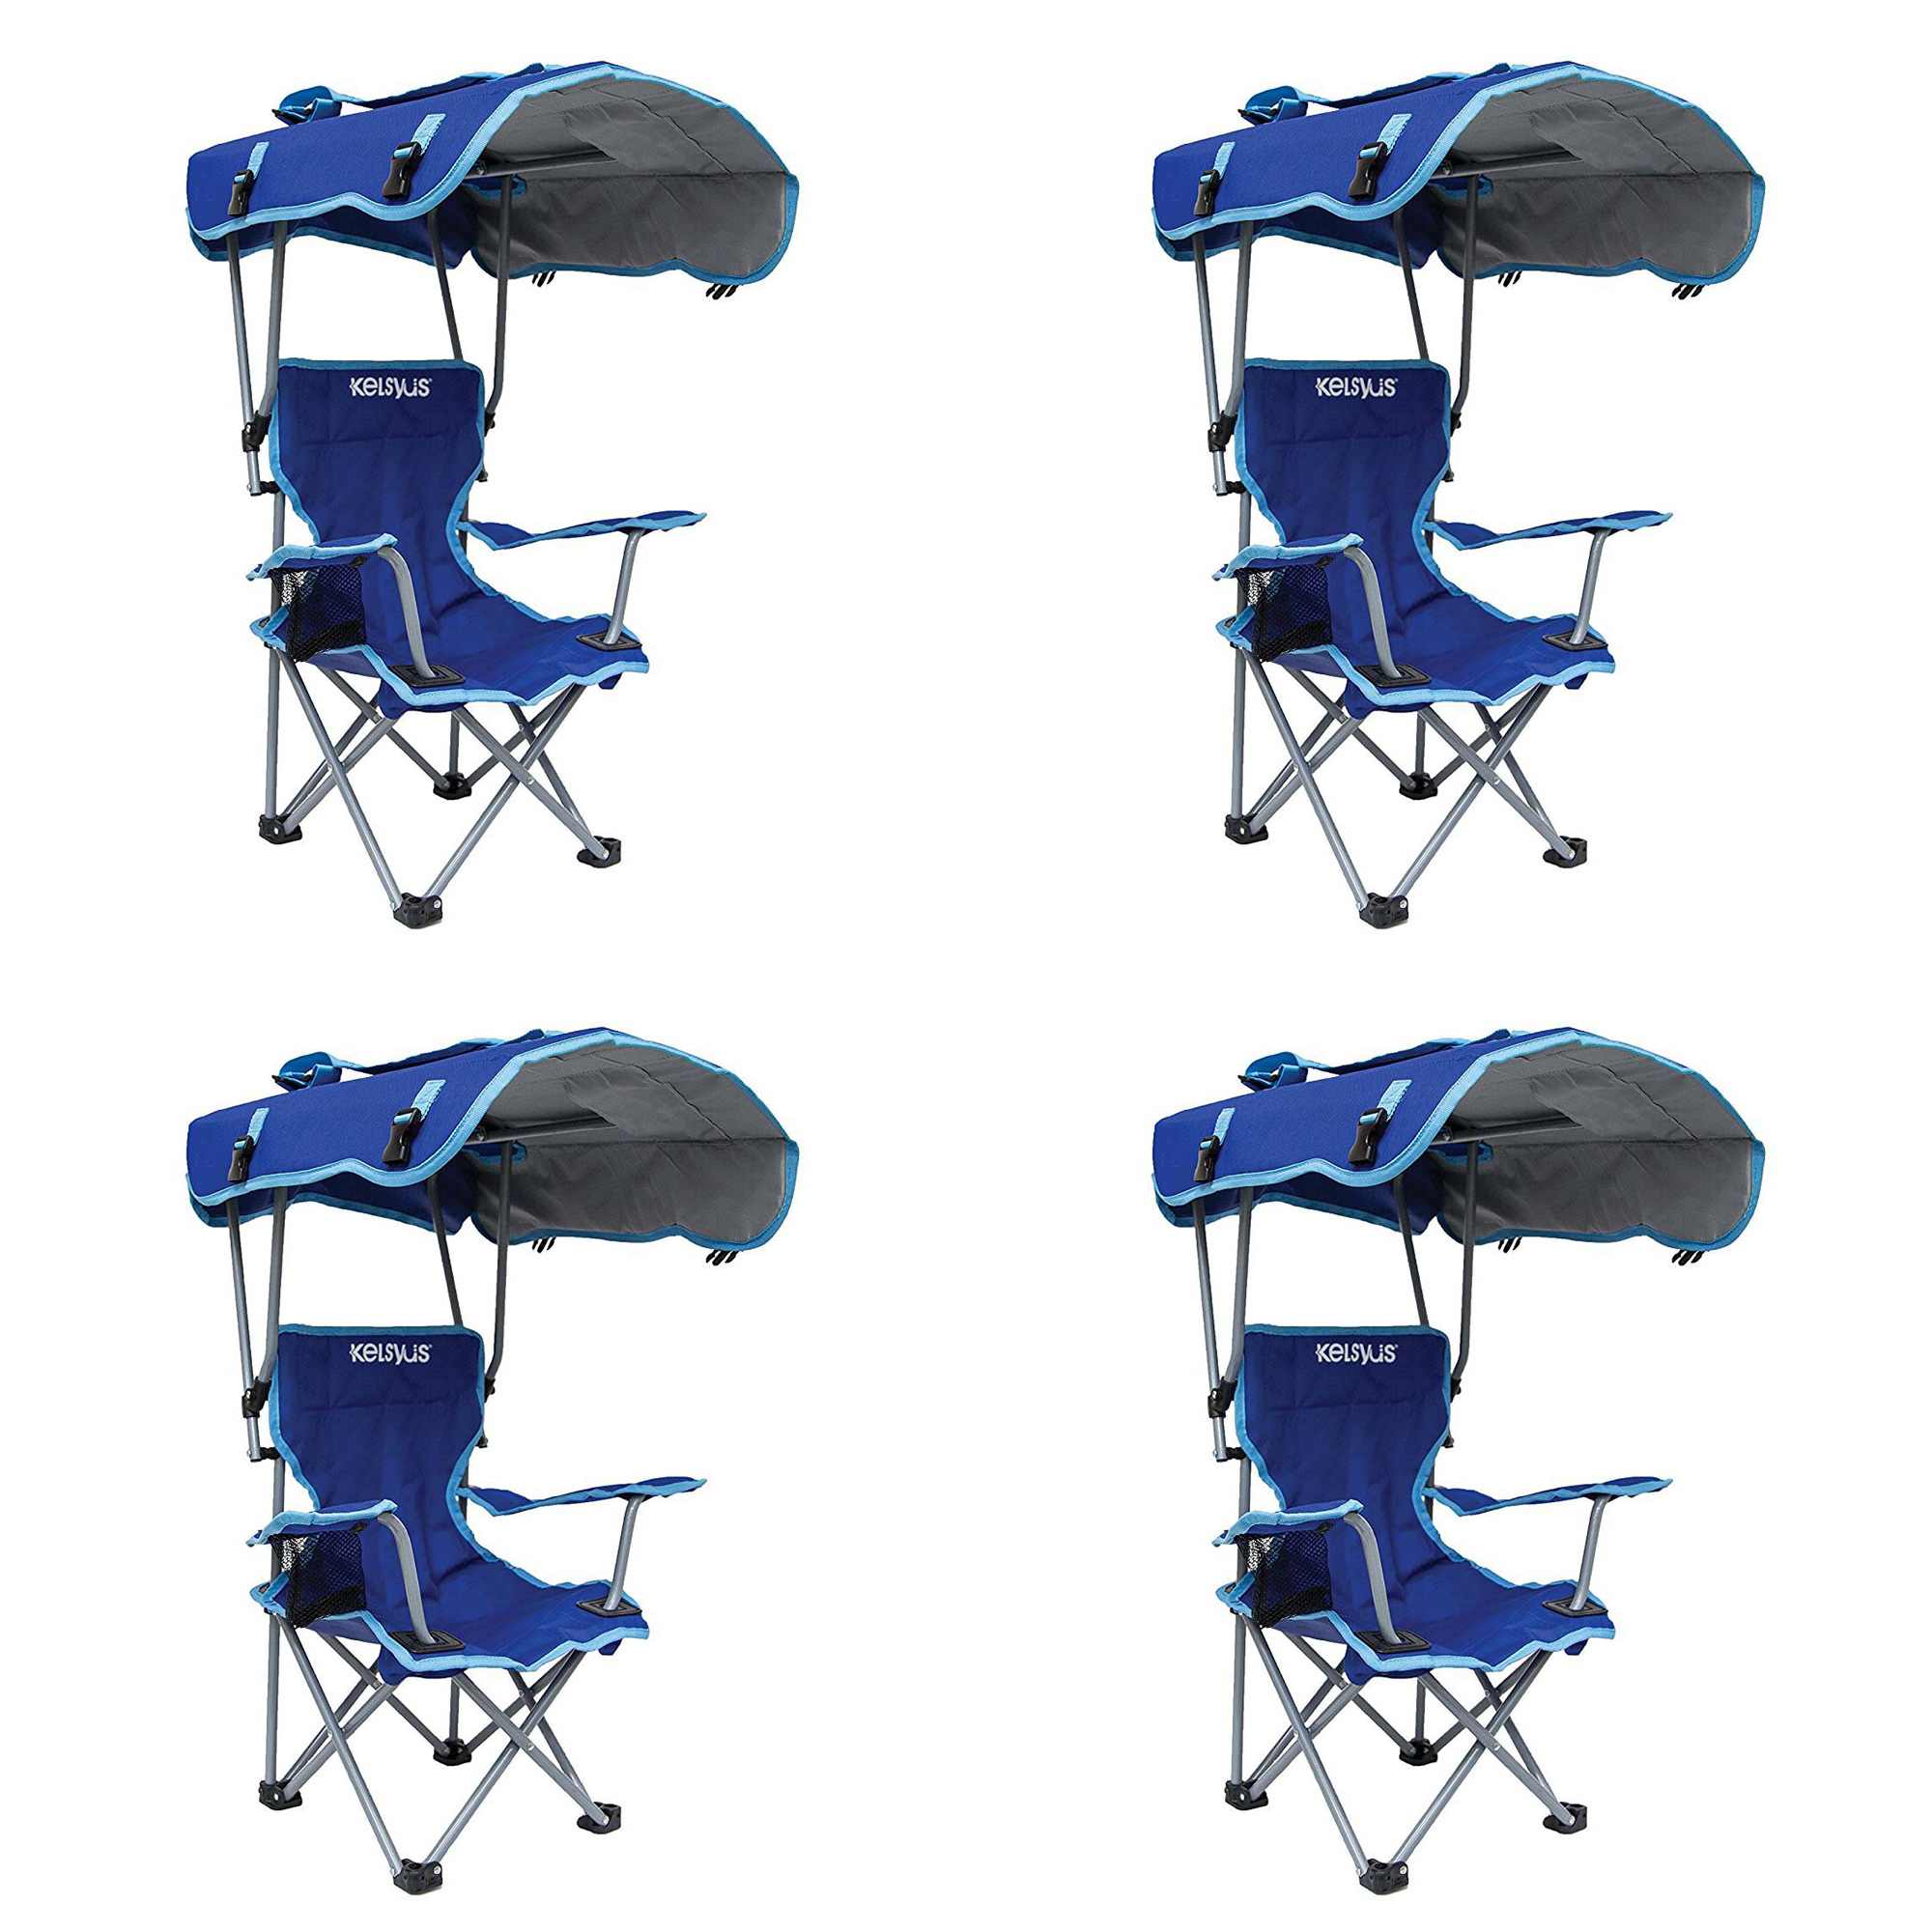 Remarkable Details About Kelsyus Kids Original Canopy Folding Backpack Lounge Chair Blue 4 Pack Customarchery Wood Chair Design Ideas Customarcherynet